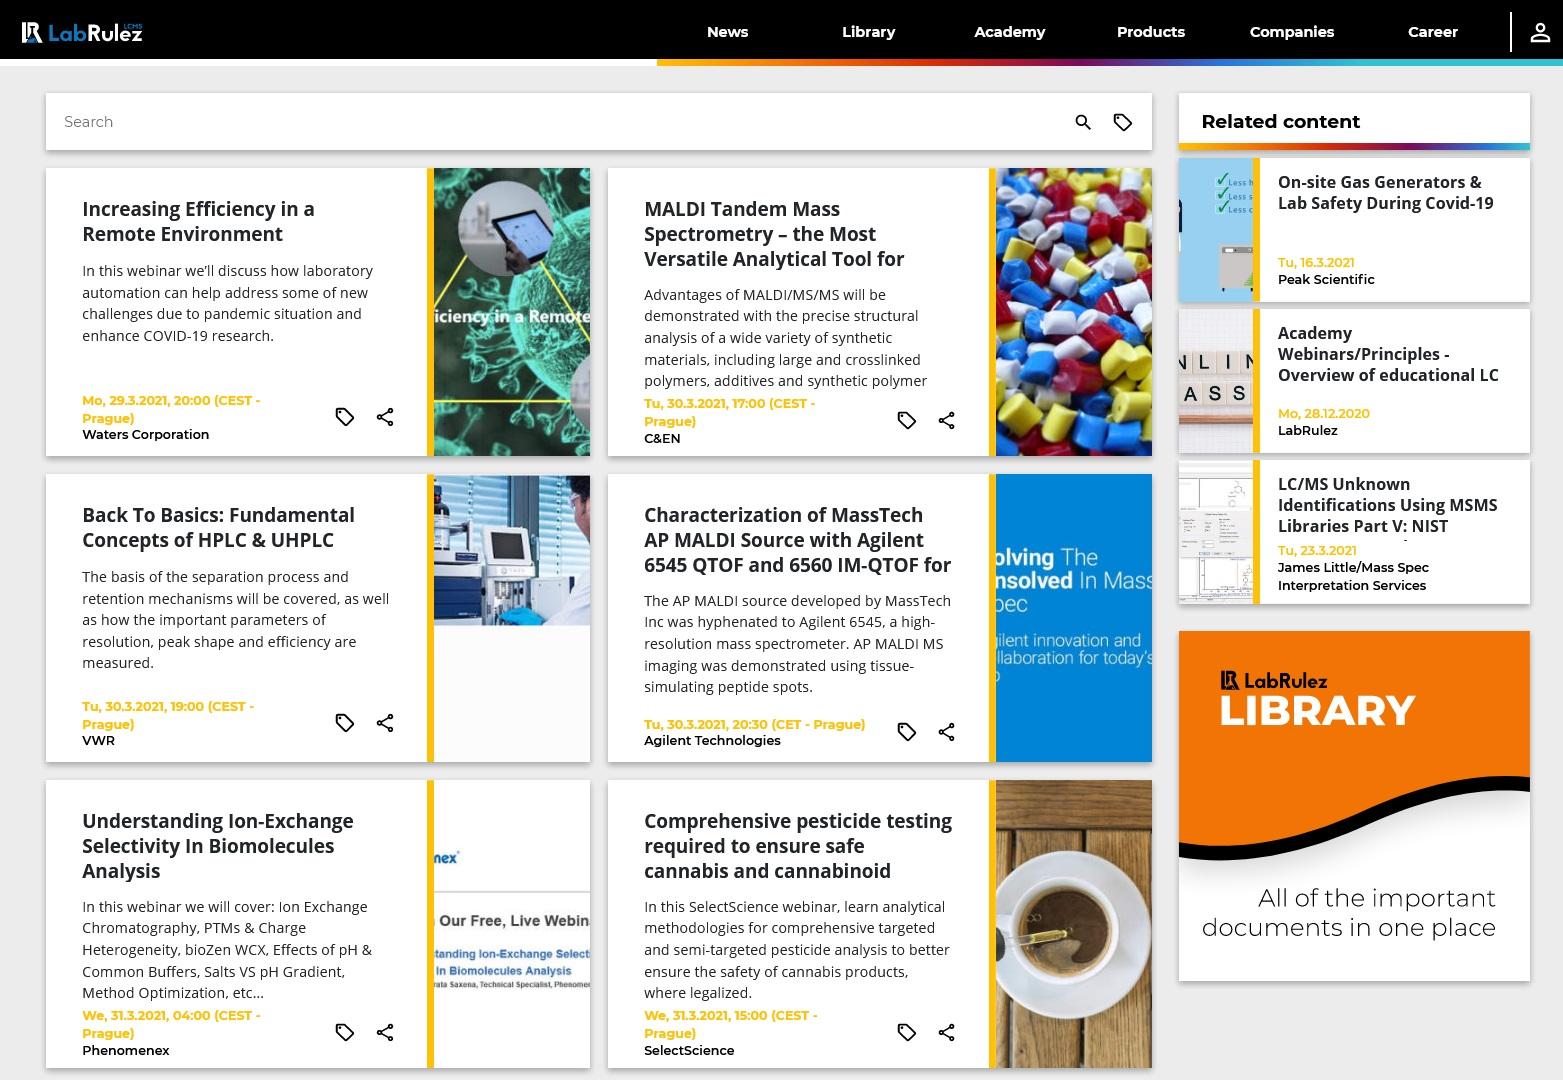 LabRulez: LC and LCMS webinars - Week 13